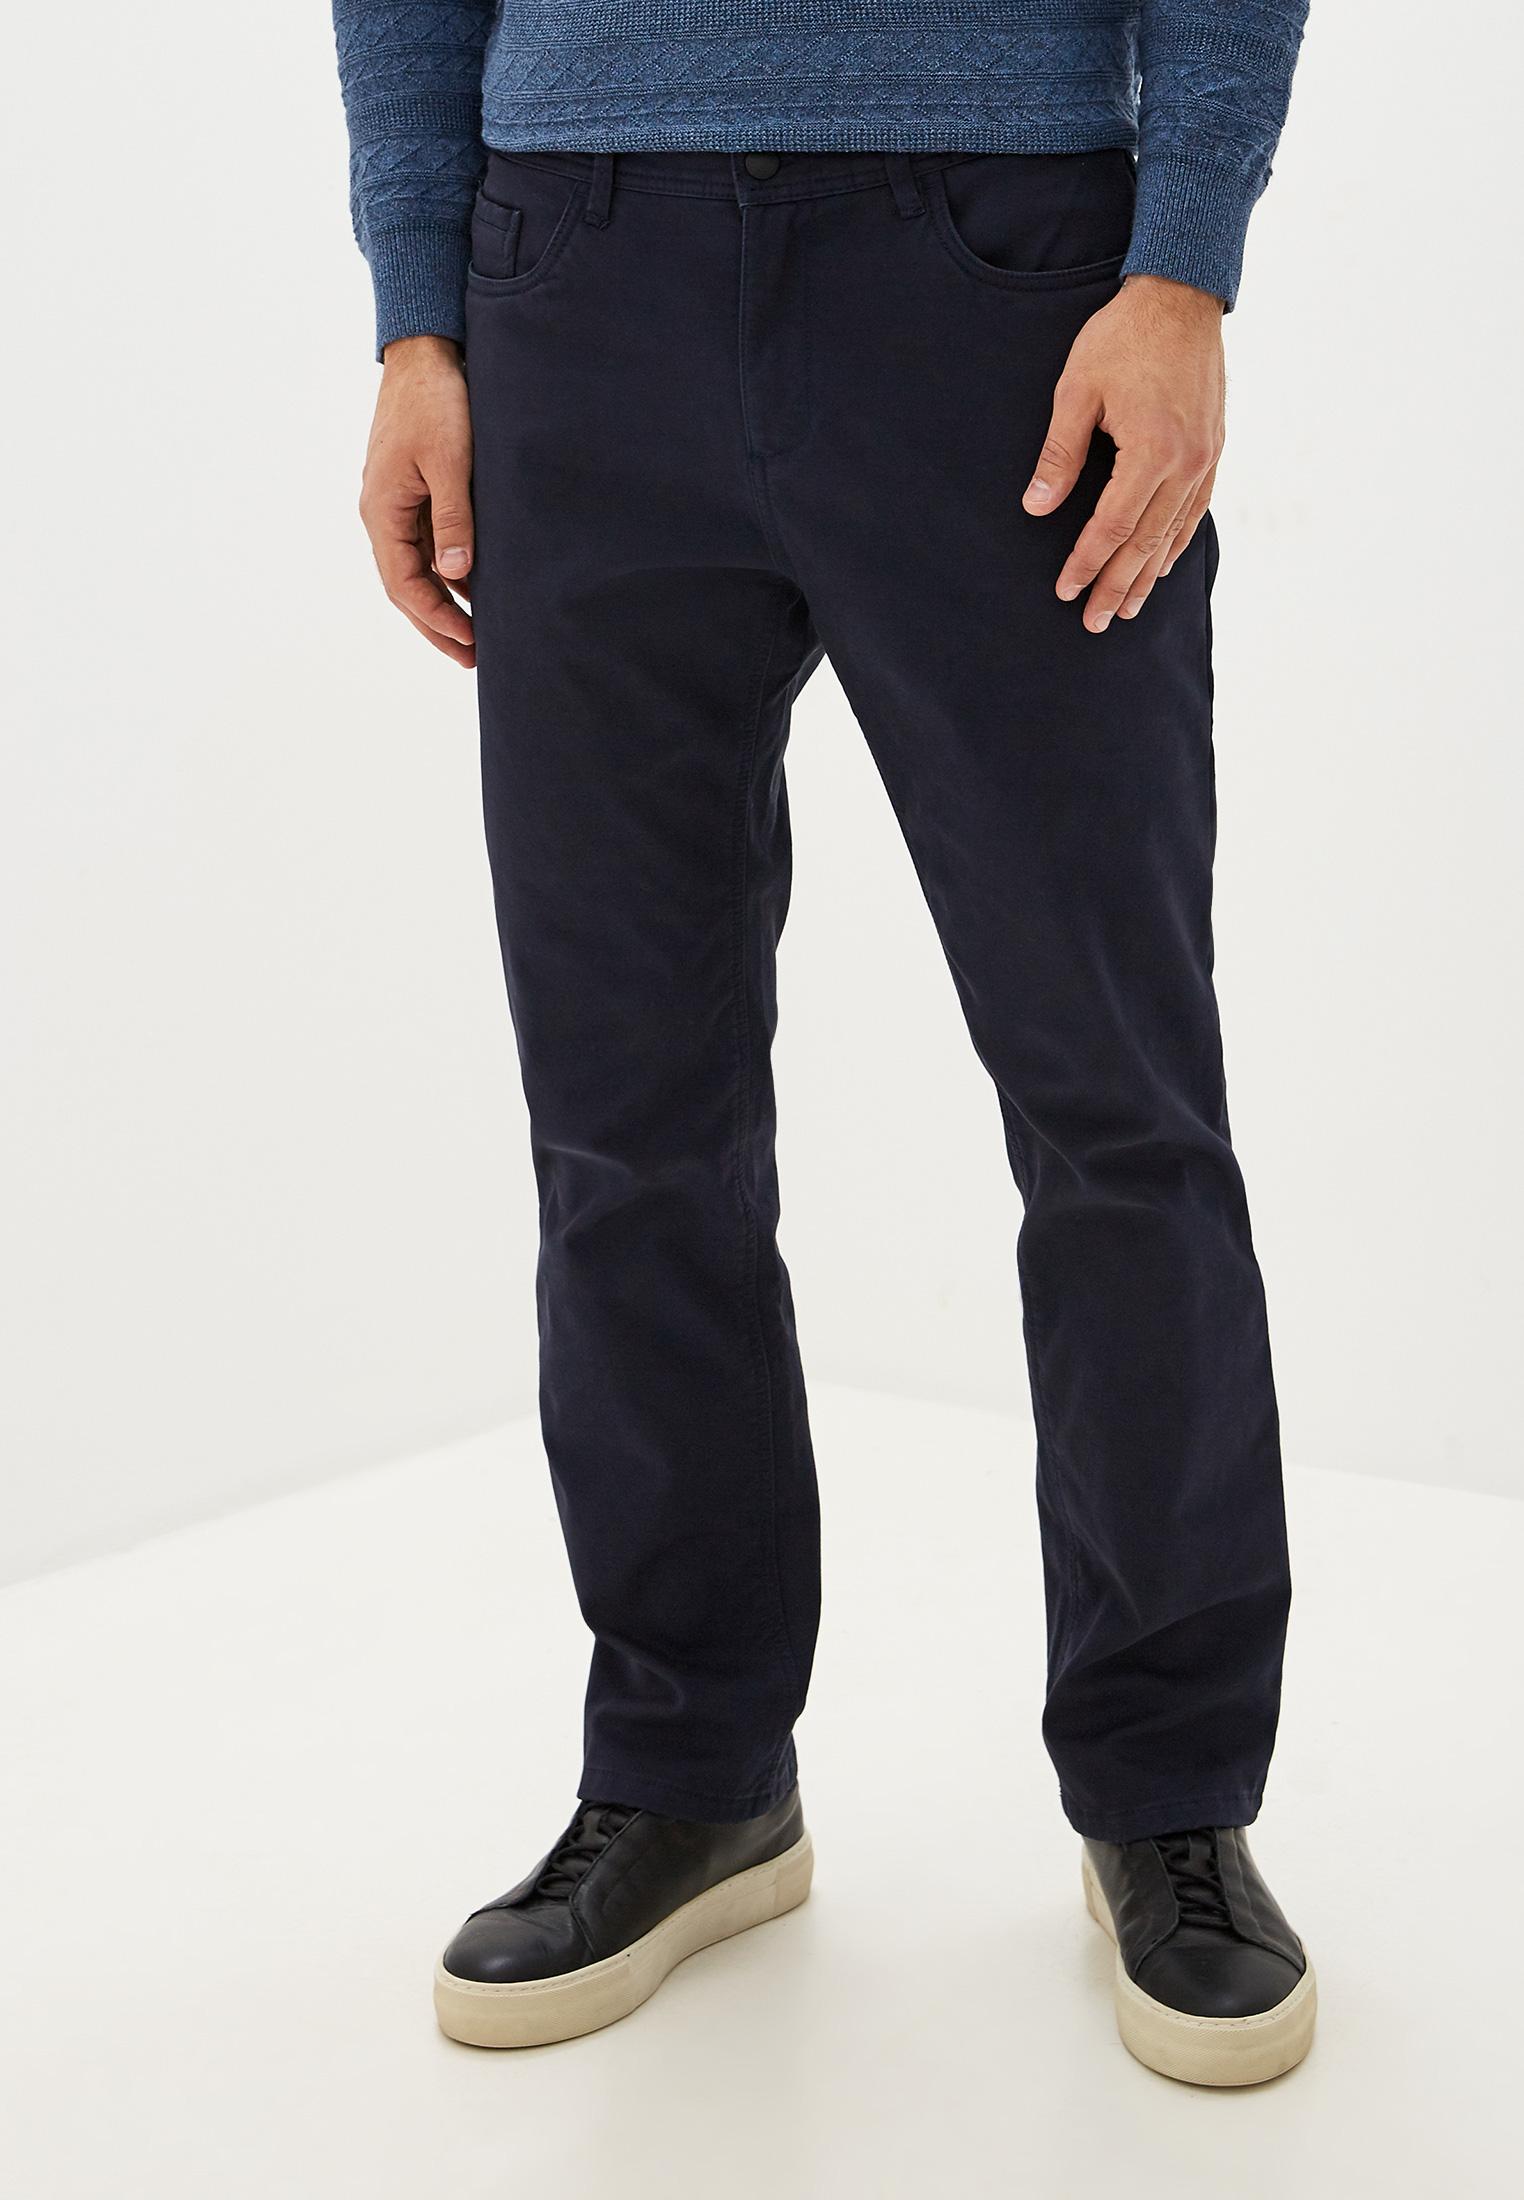 Мужские зауженные брюки O'stin MP4V82